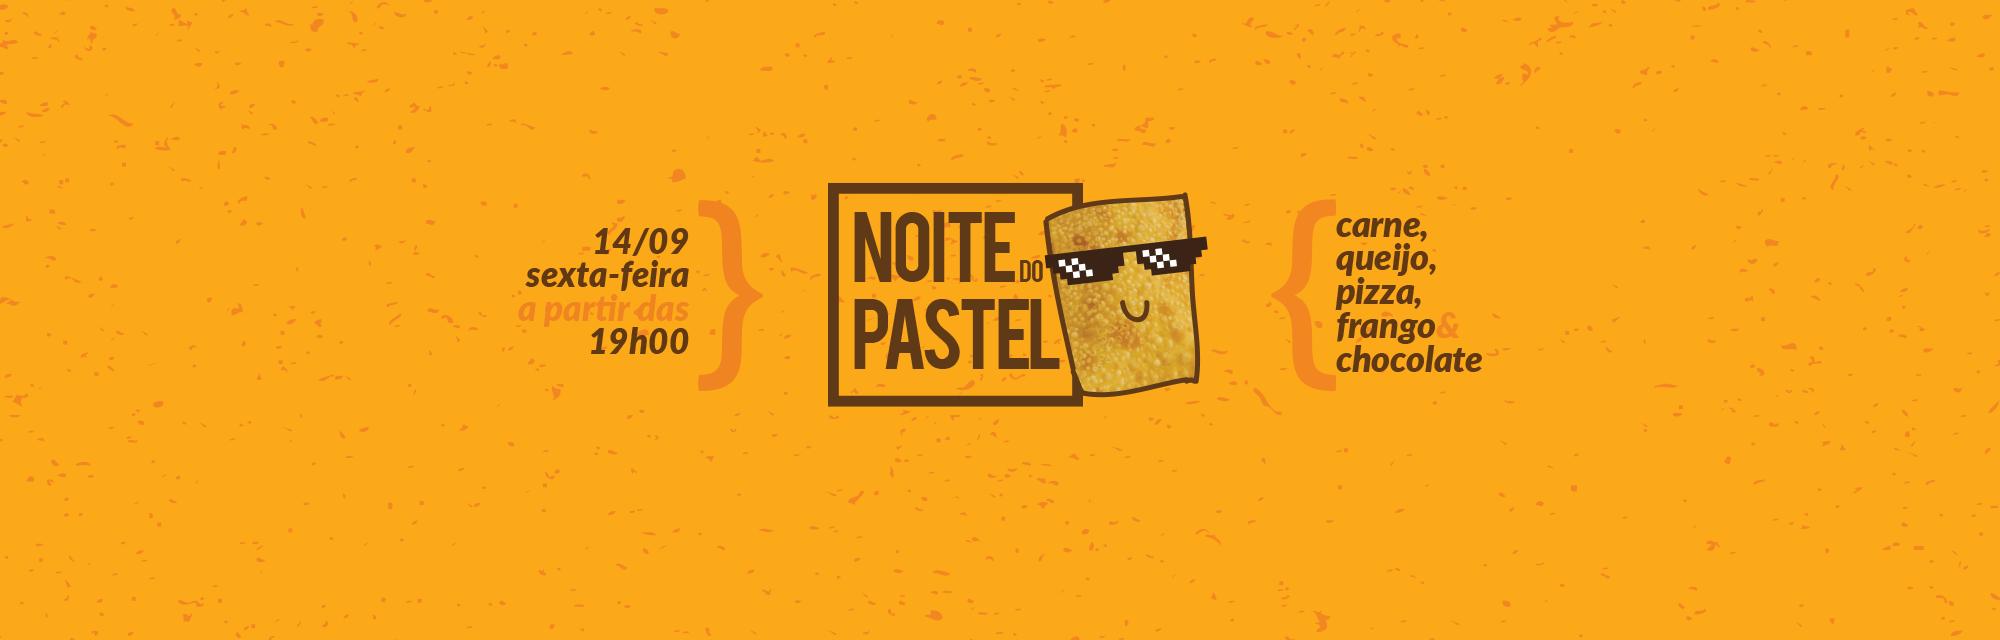 NOITE-DO-PASTEL